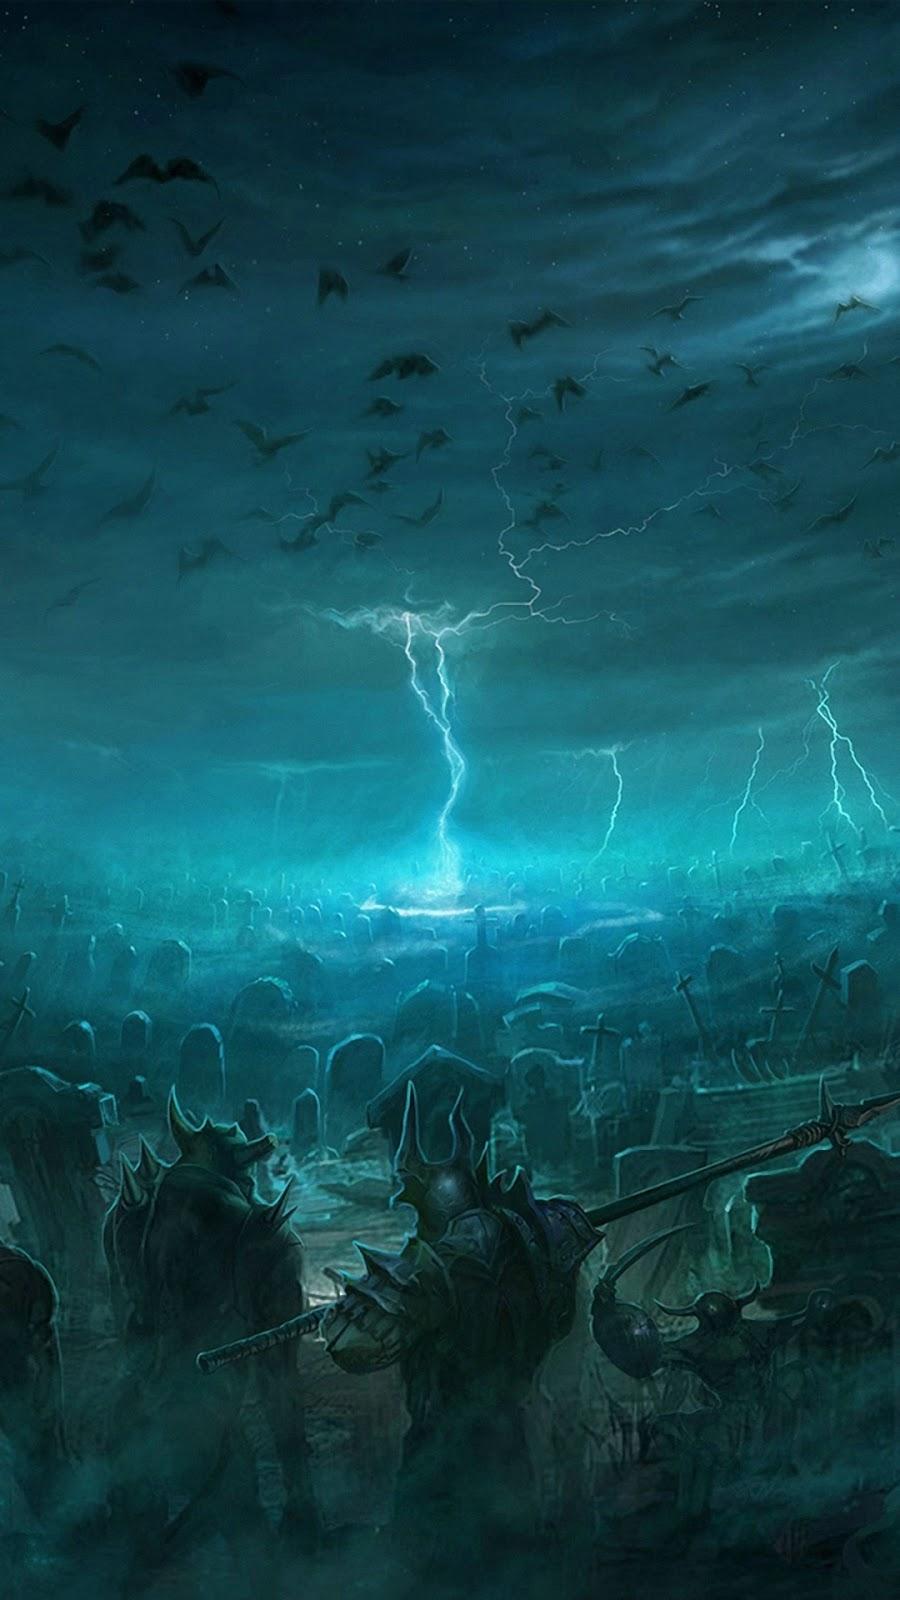 Thunder Background Png